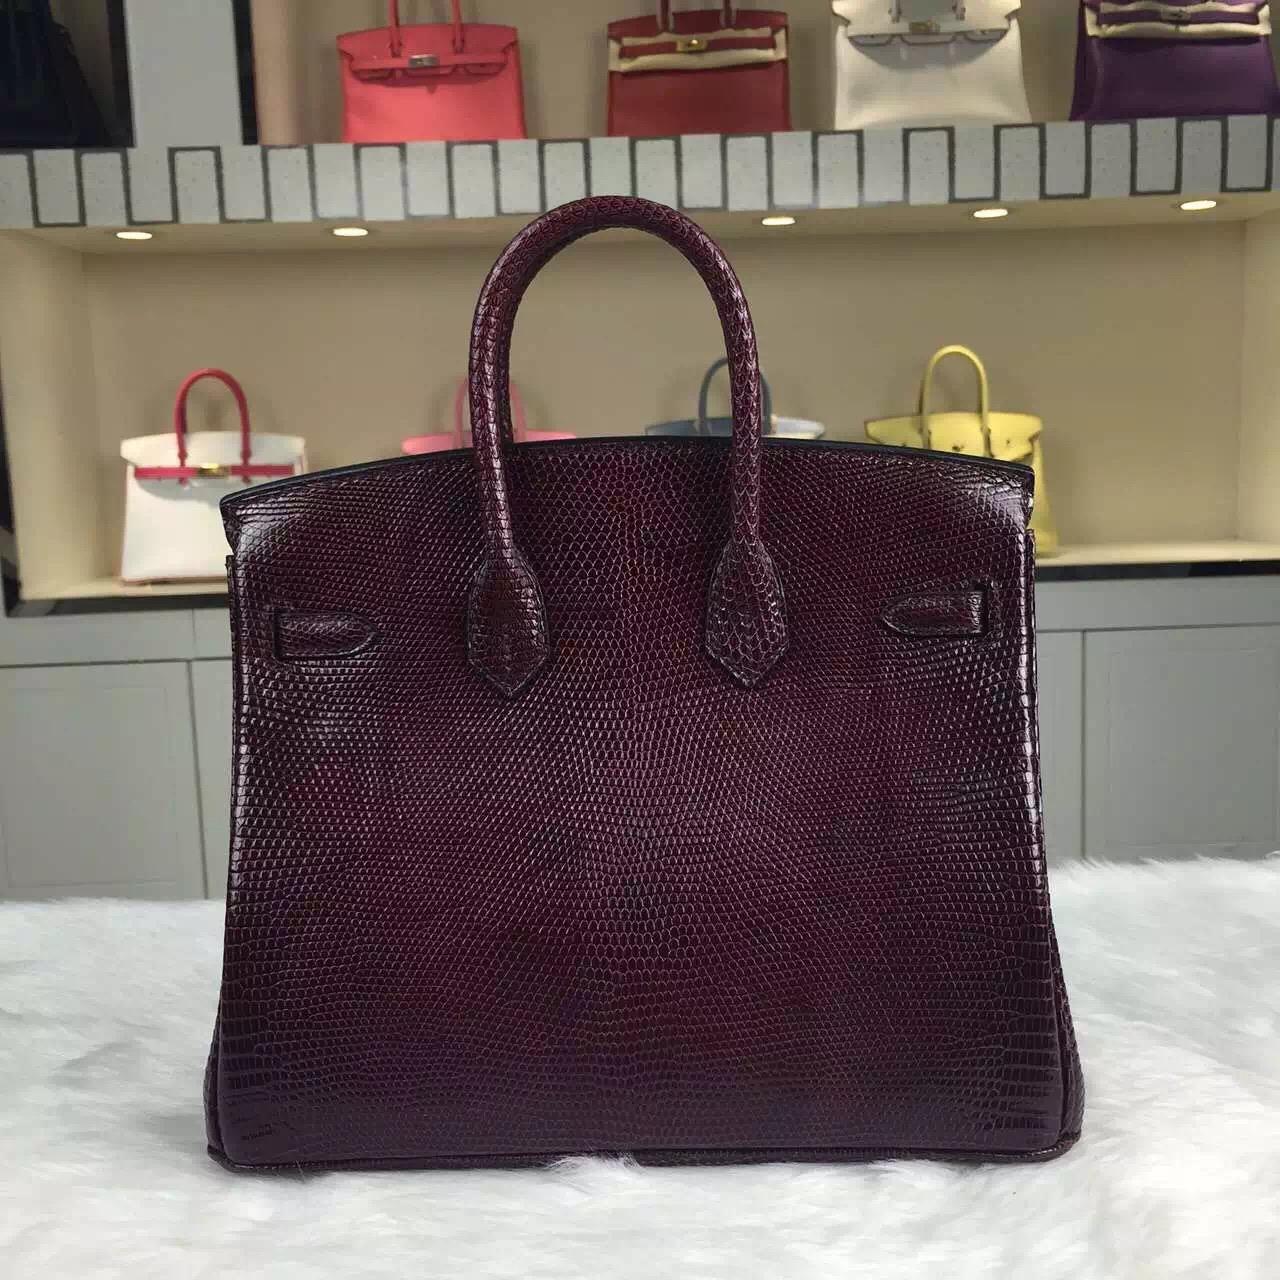 Wholesale Hermes Lizard Skin Leather Birkin25cm CK57 Bordeaux Red